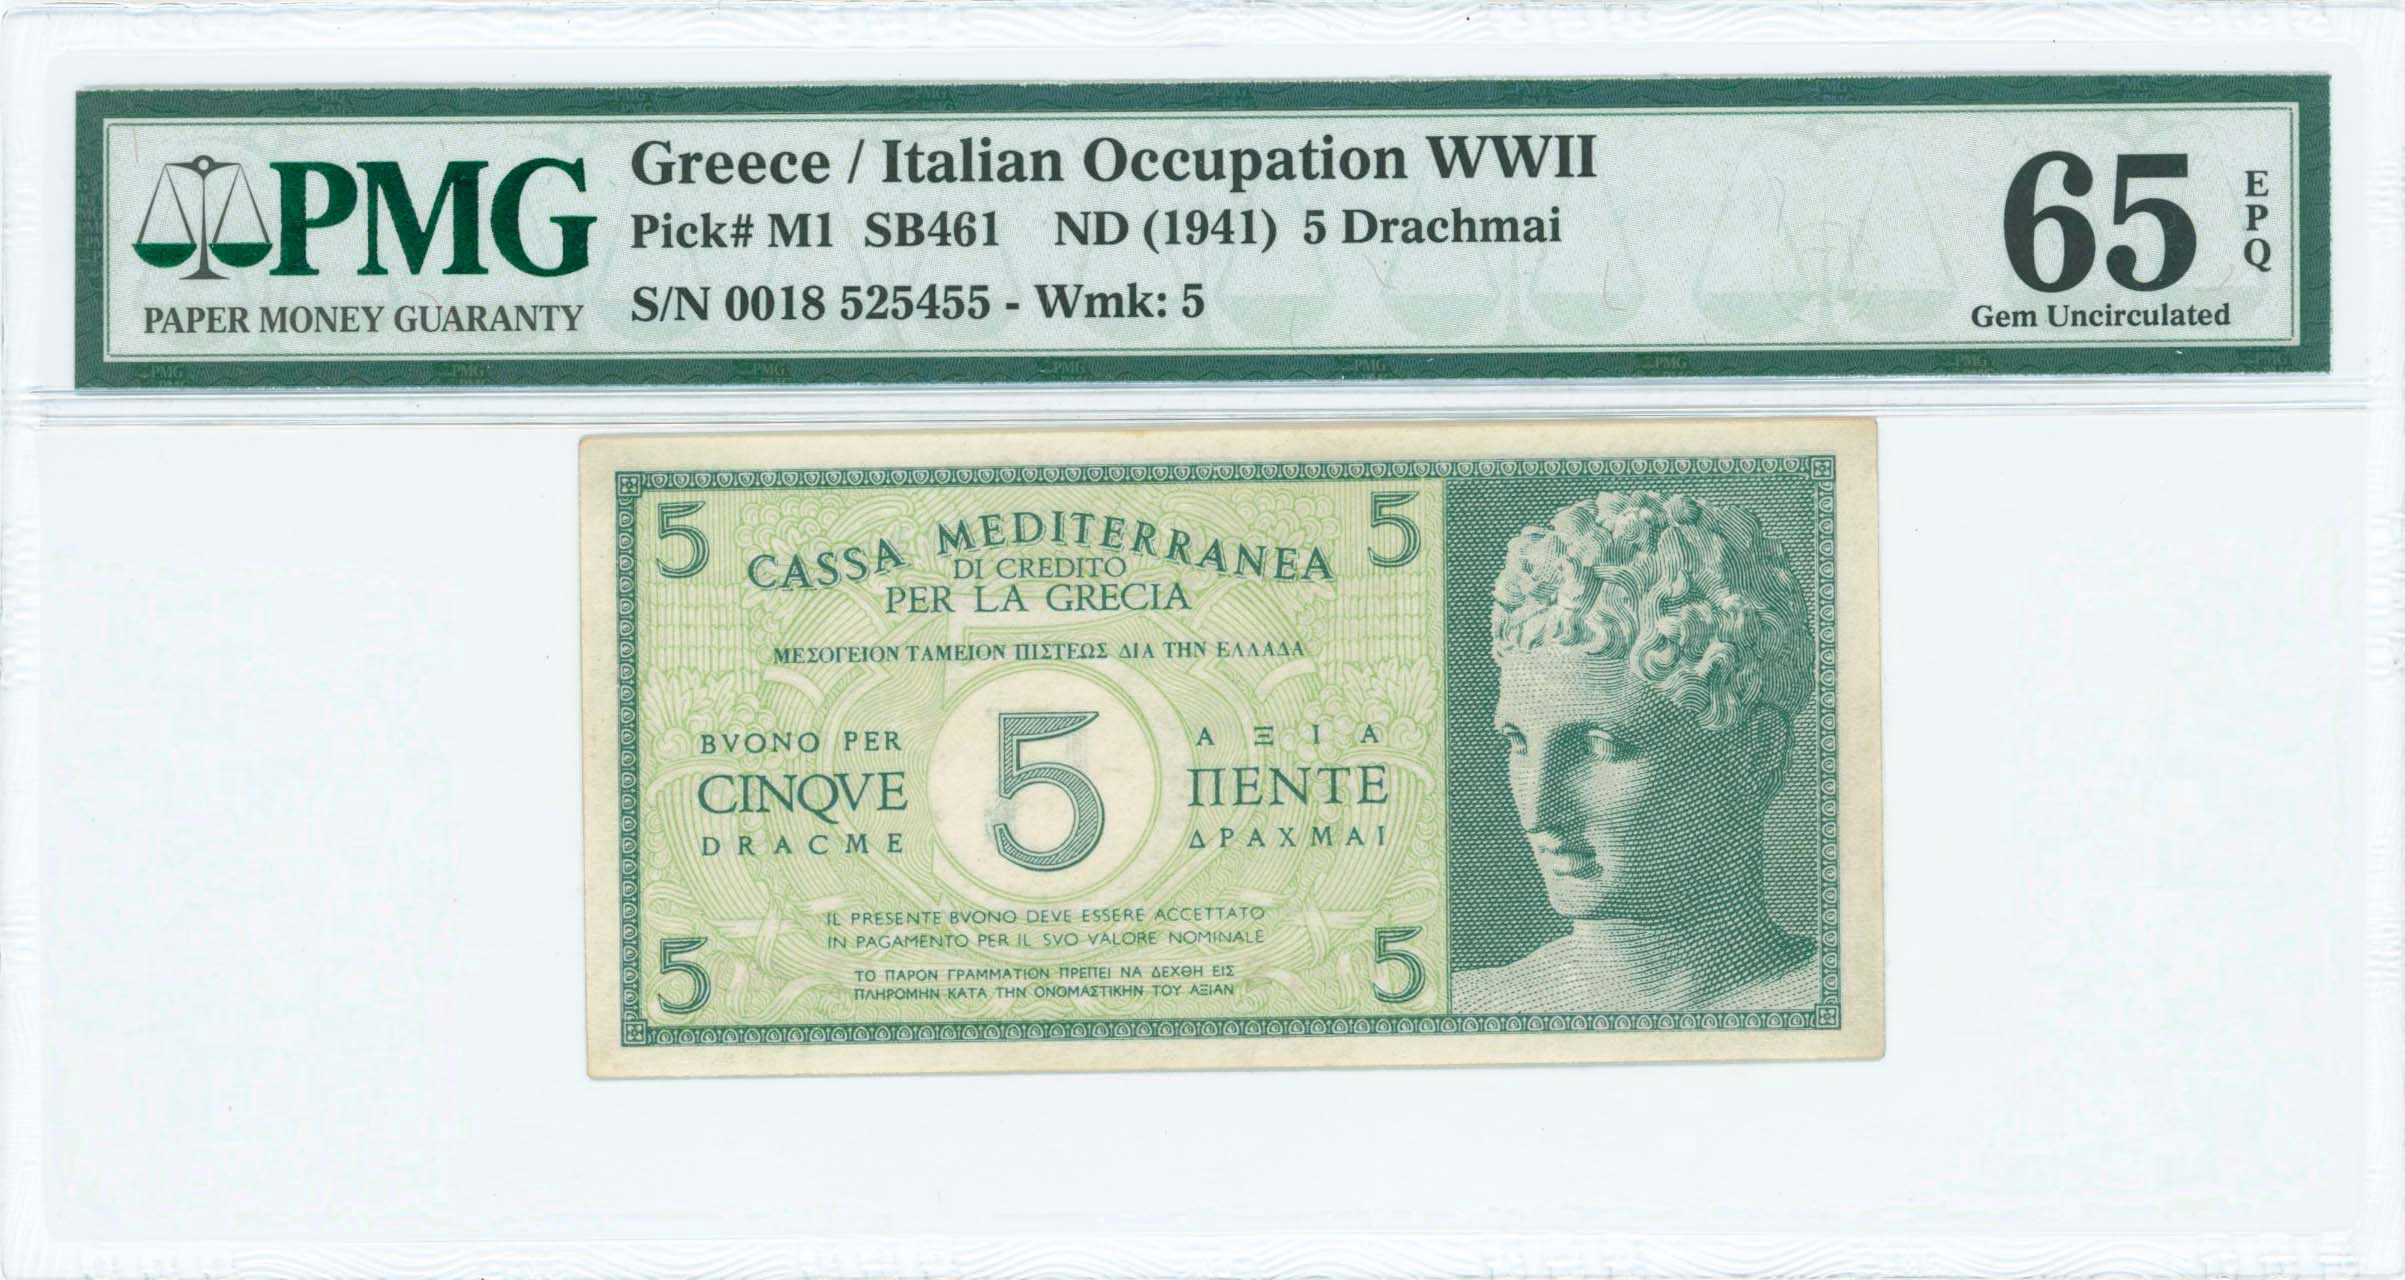 Lot 6733 - -  PAPER MONEY - BANKNOTES italian occupation -  A. Karamitsos Public & Live Internet Auction 671 (Part A)